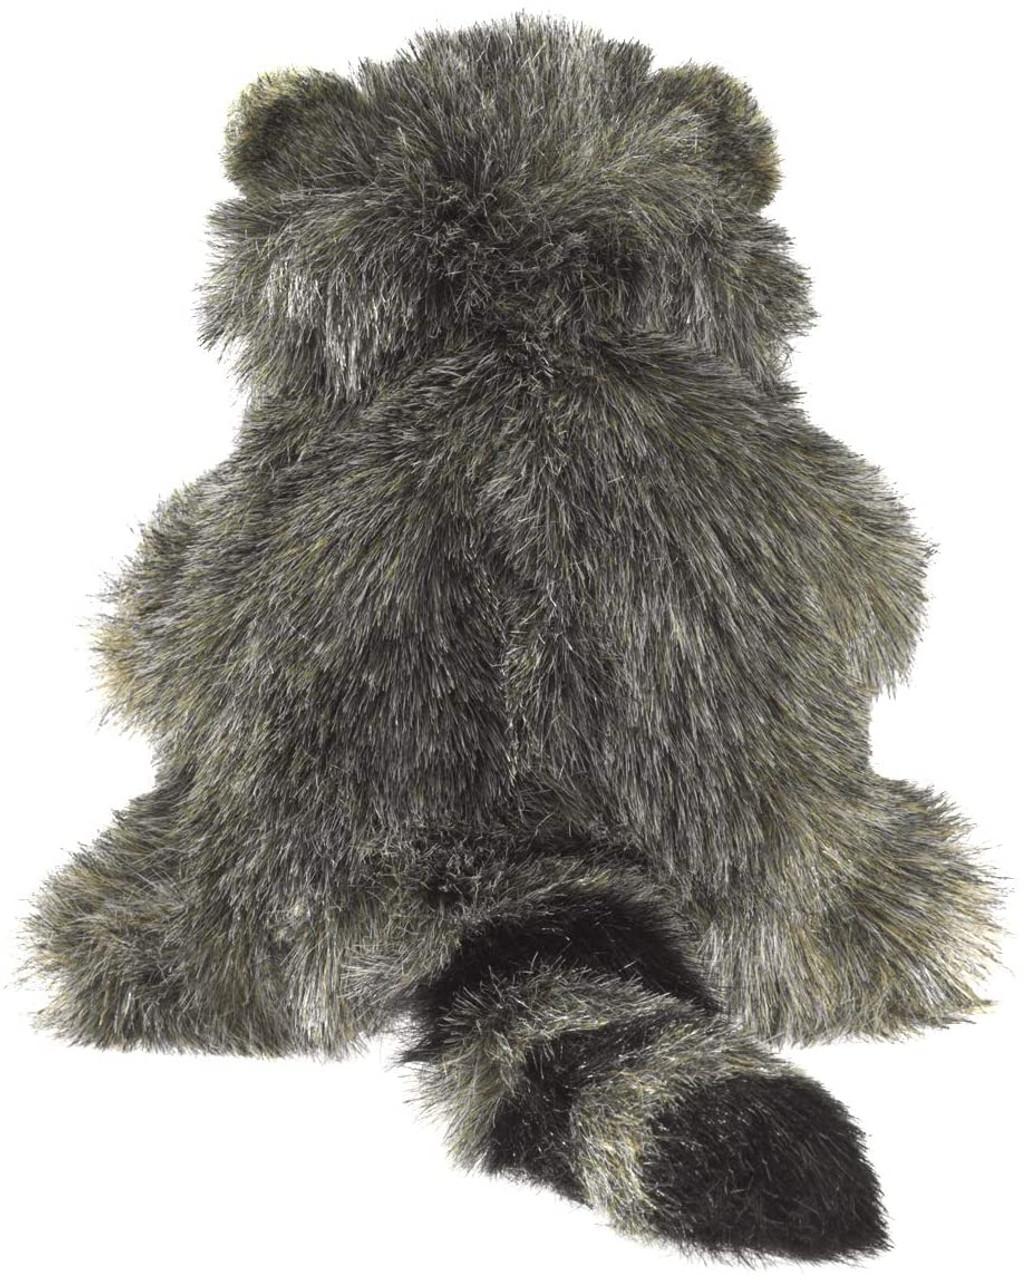 Raccoon Baby Hand Puppet - F019B405